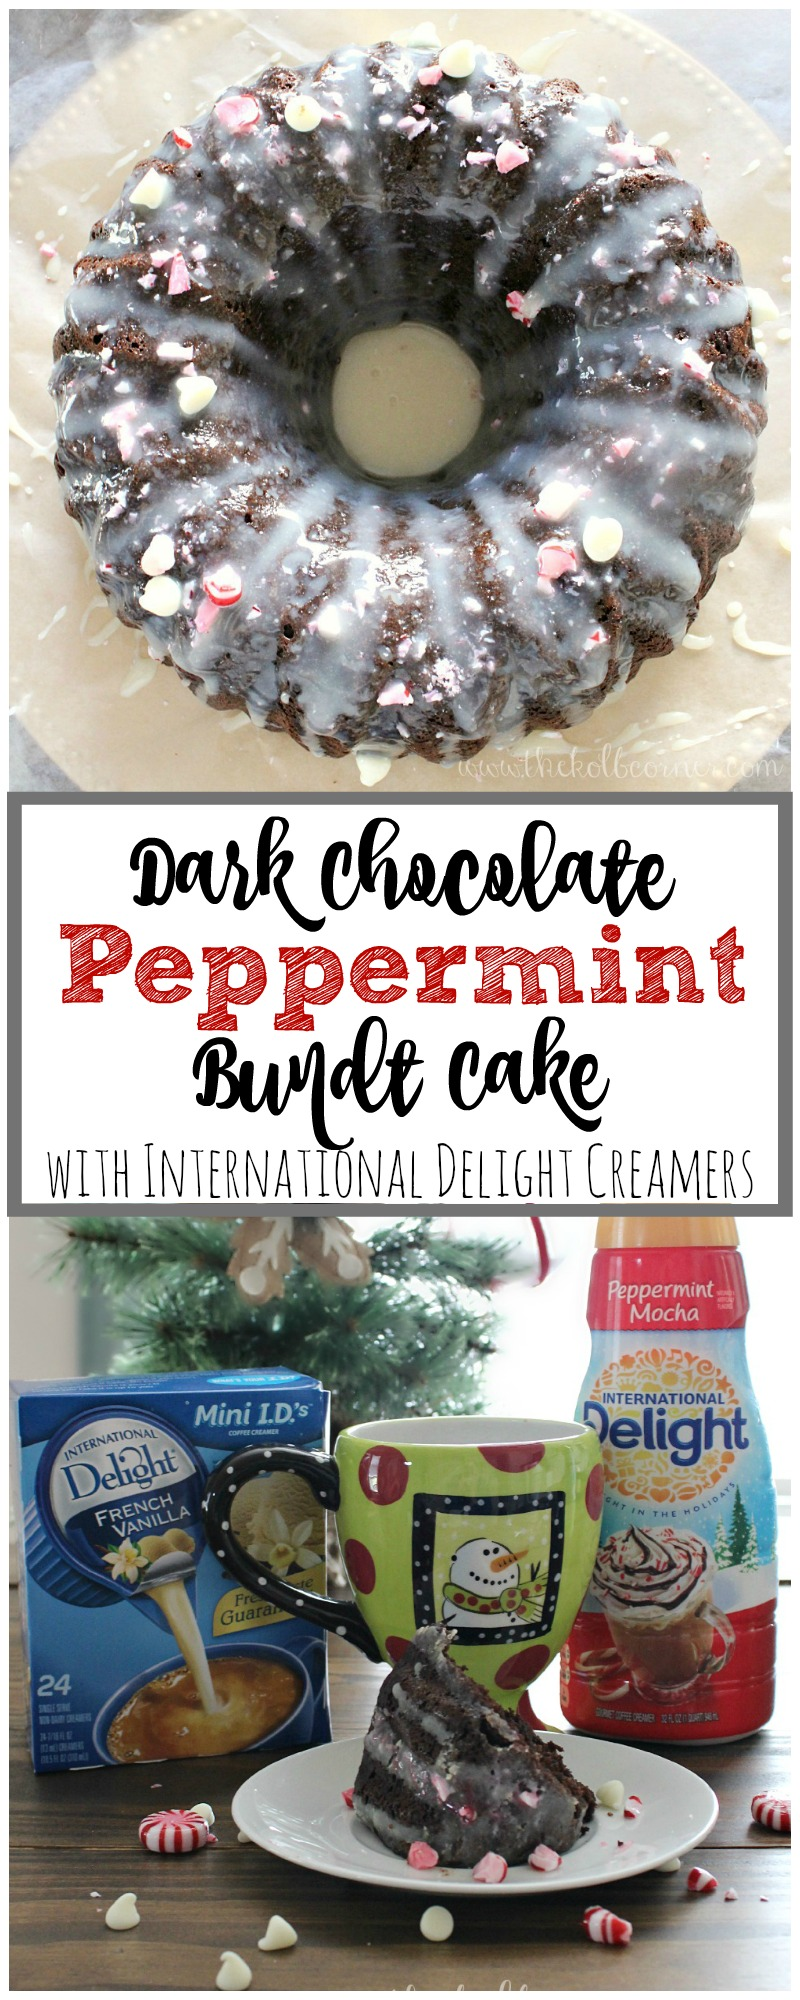 Dark-Chocolate-Peppermint-Bundt-Cake-Hero